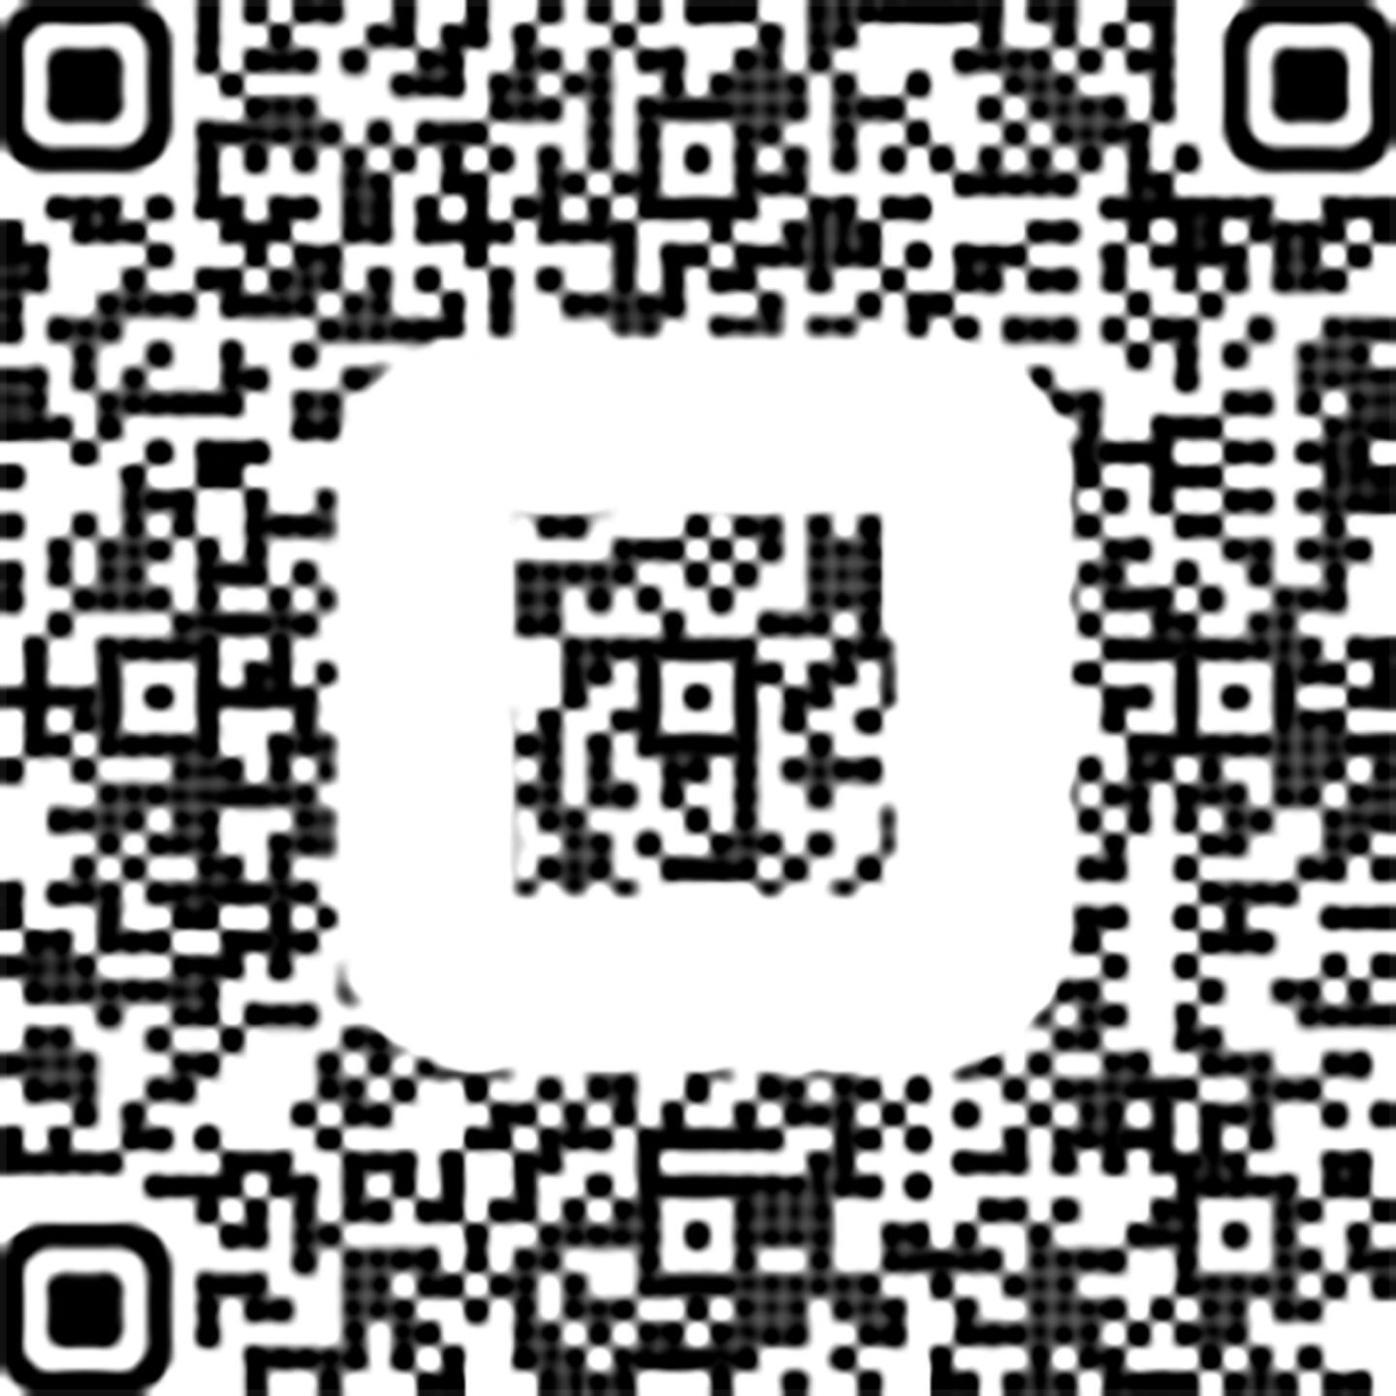 scca_qr_code